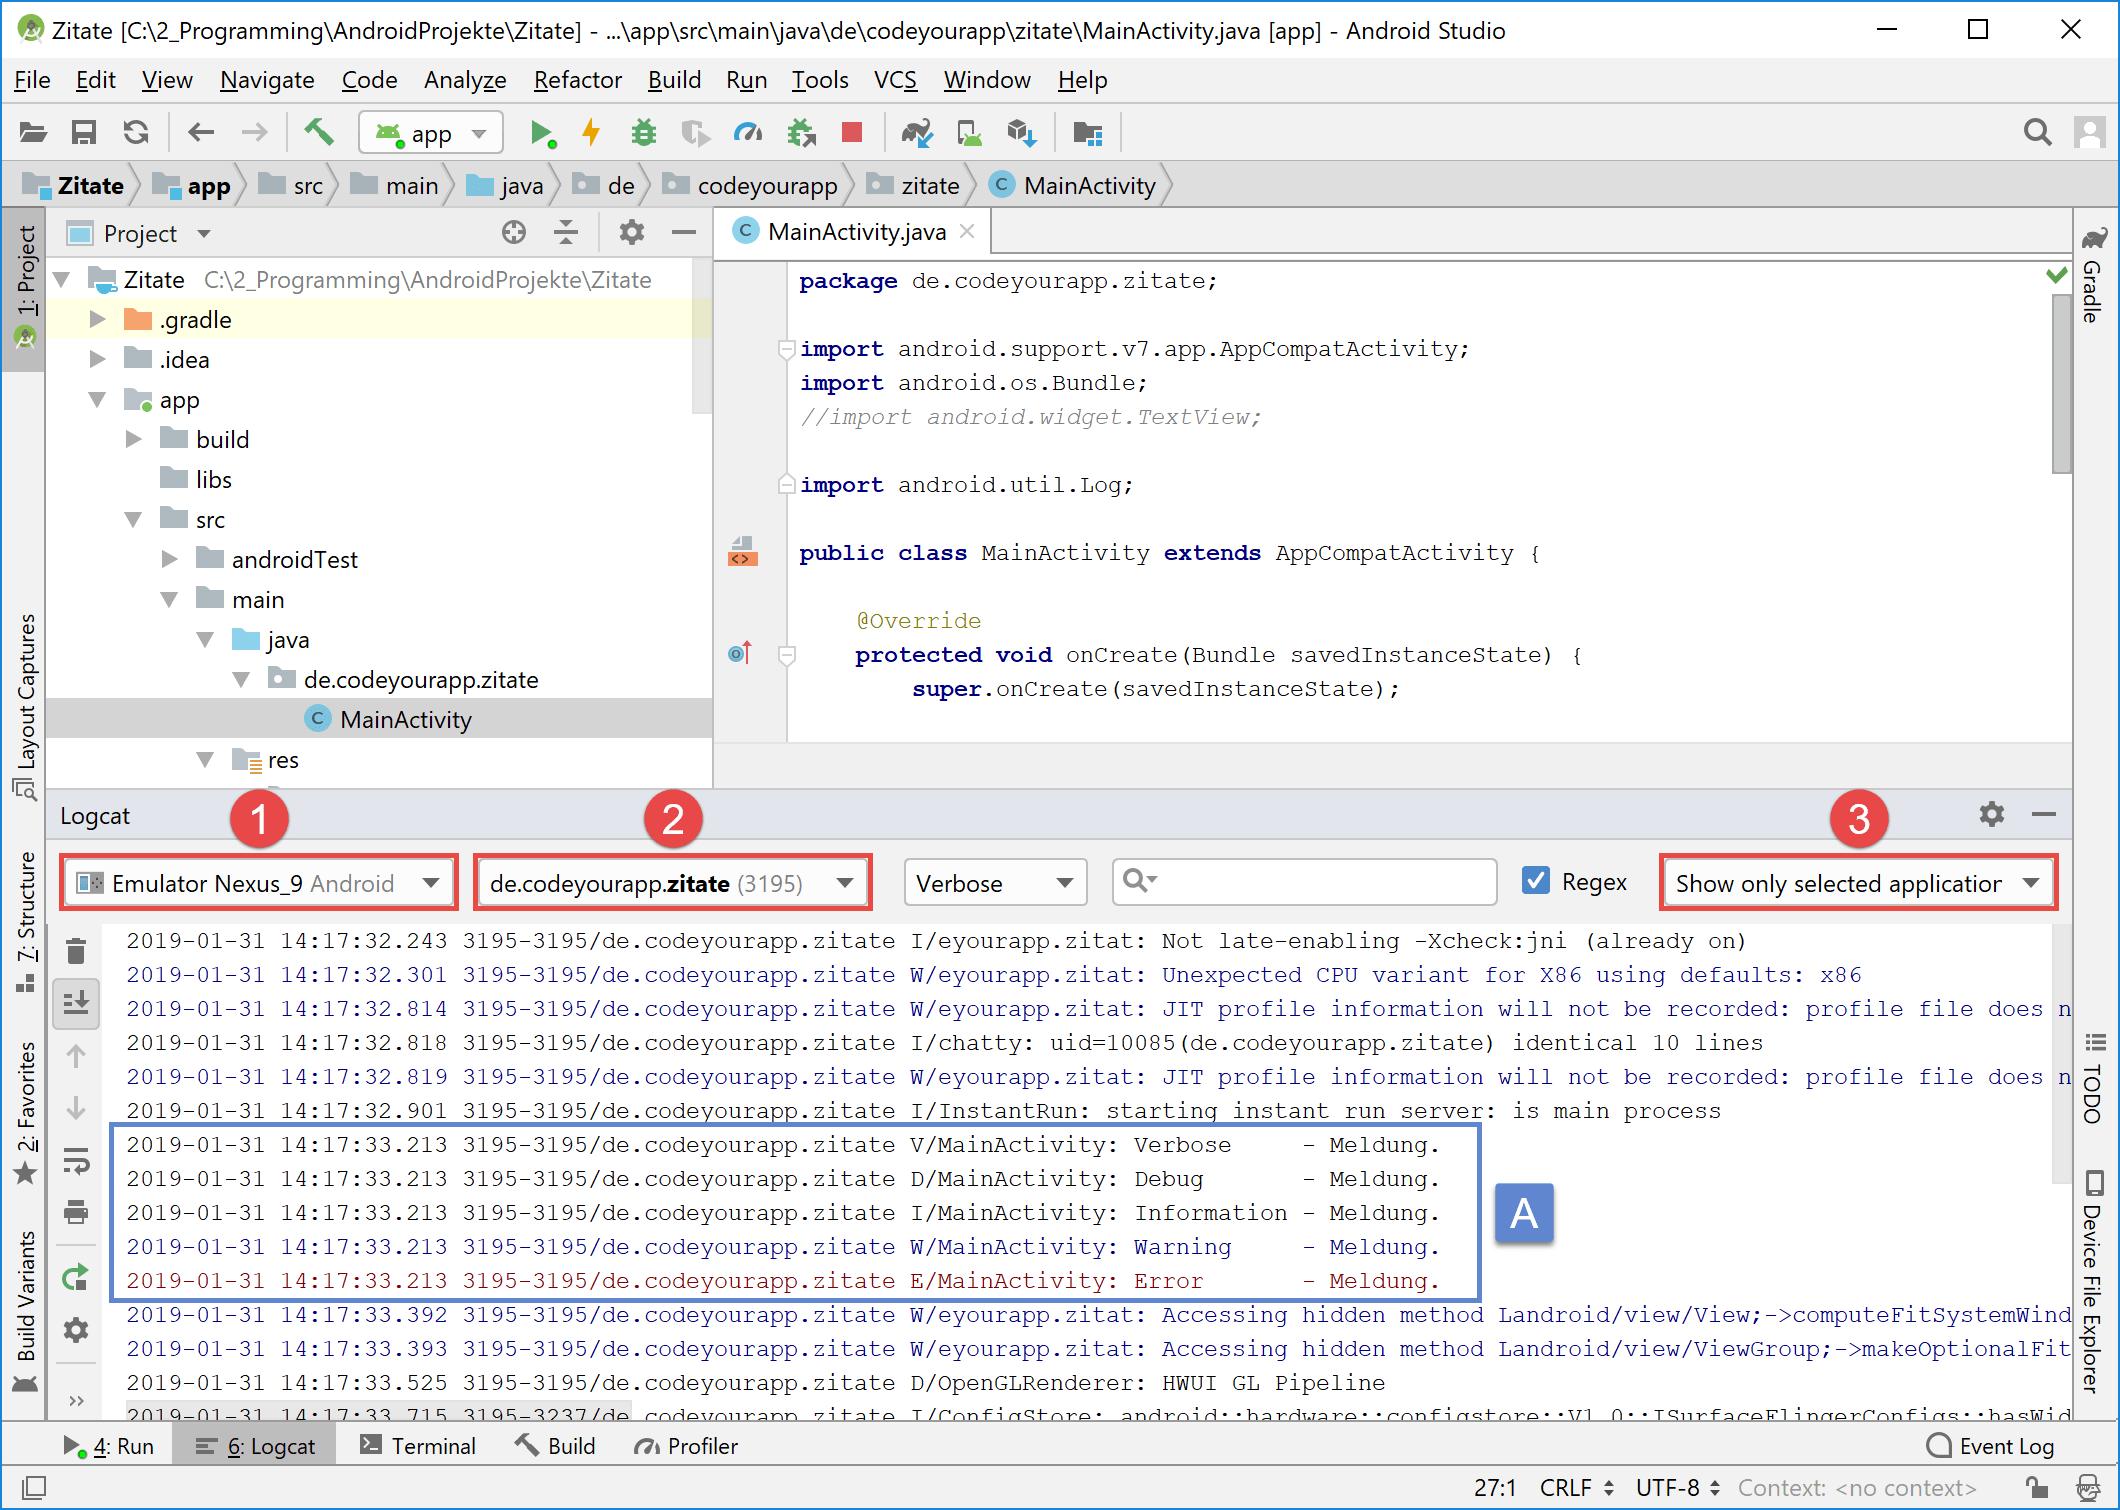 logcat_tool_window_log